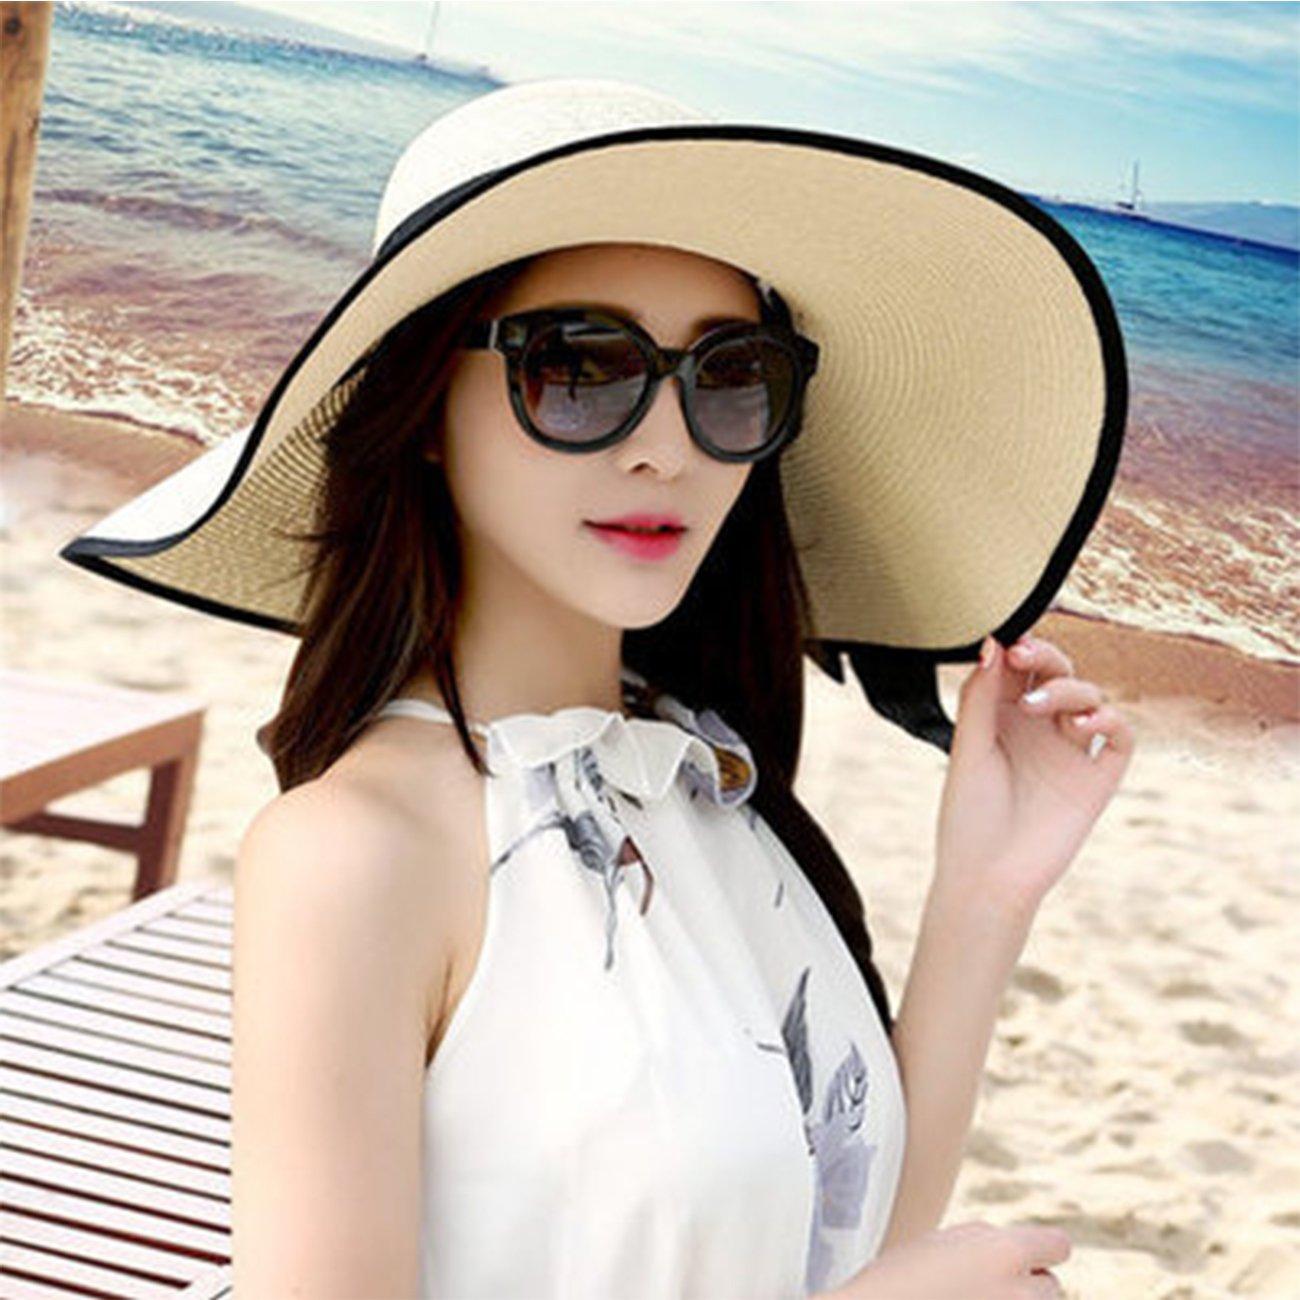 b6badbf1 DRESHOW Beach Sun Hat for Women Wide Brim Floppy Straw Sun Hats Roll up  Packable UPF ...